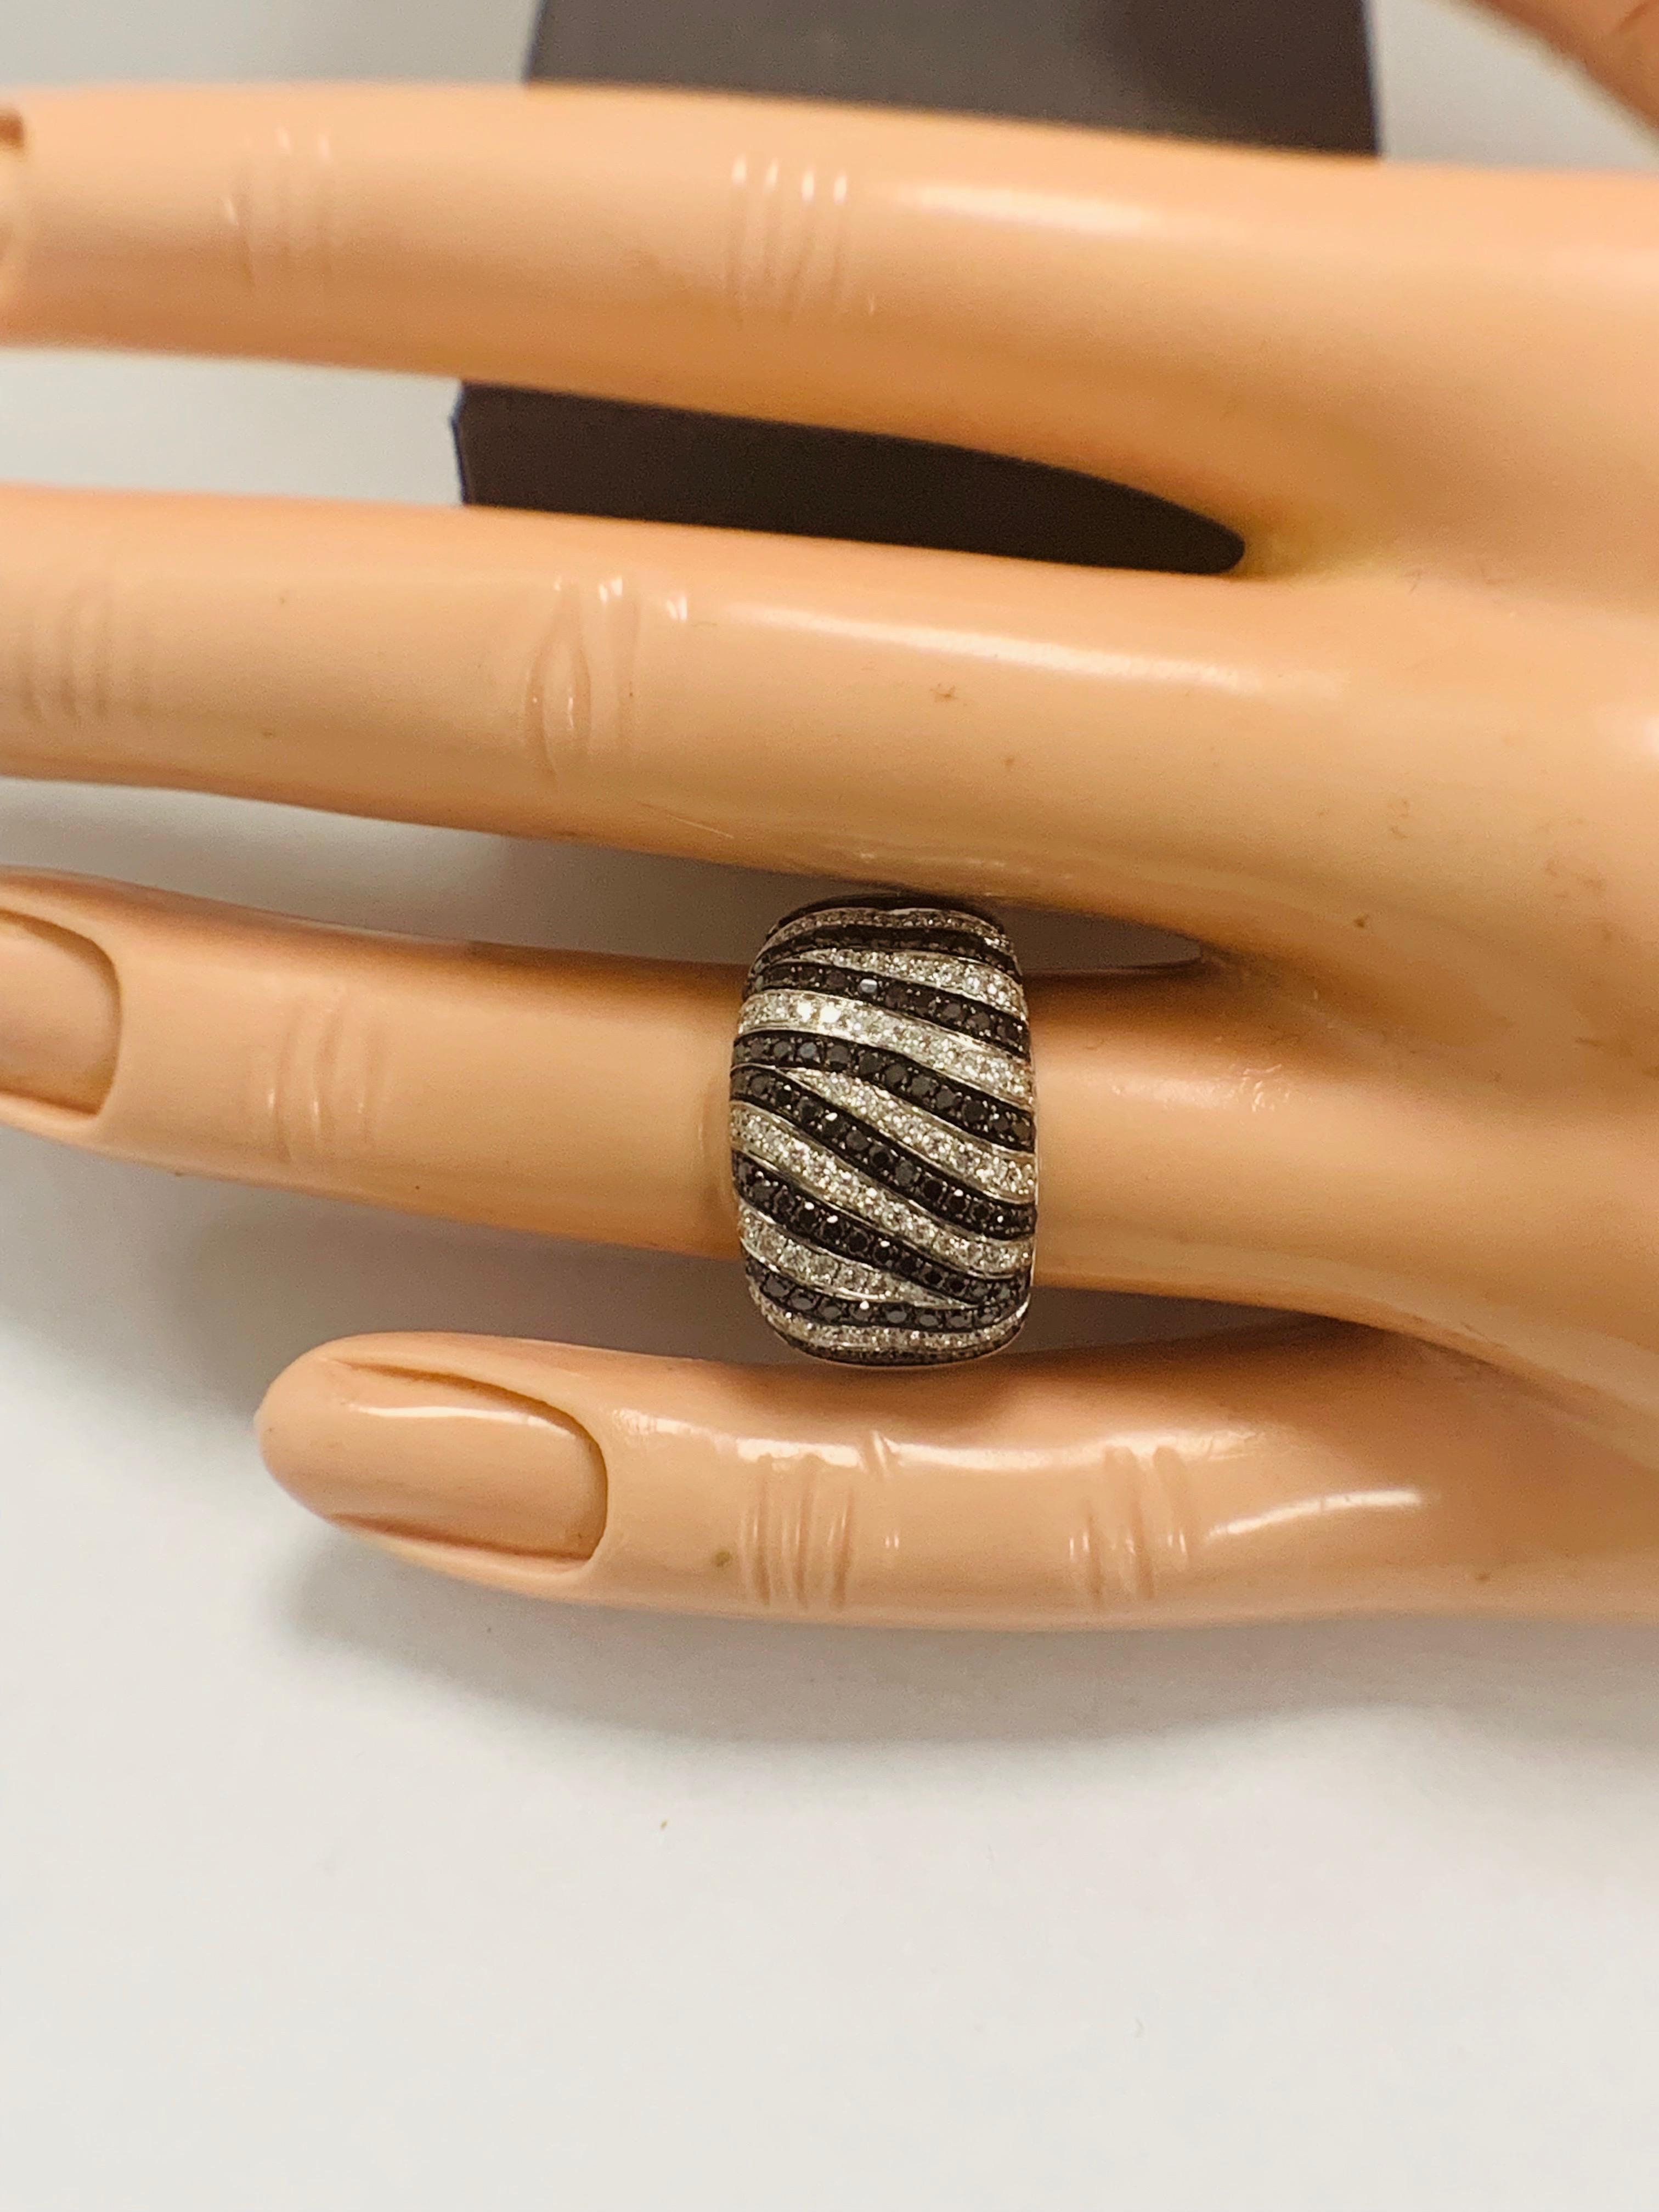 18ct White Gold Diamond ring - Image 11 of 14